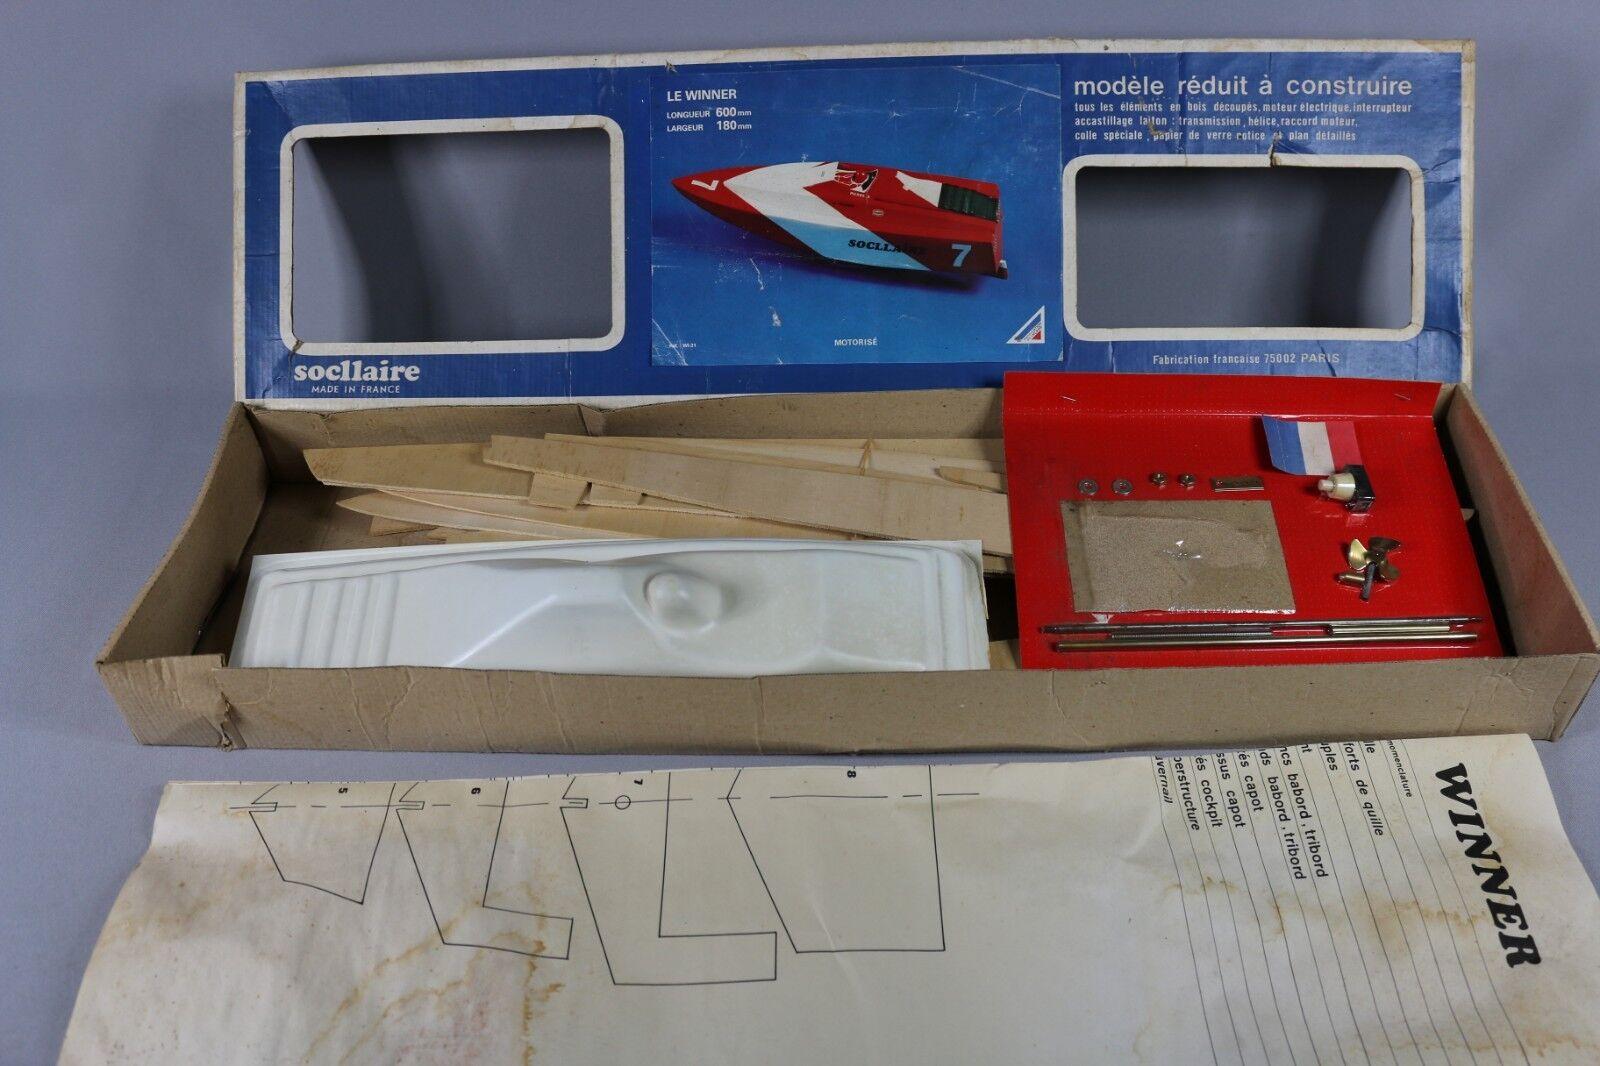 Zf040 Socllaire Maqueta Barco Madera Wi-31 The The The Winner 600x180mm Fuera de Abordo 18d2cf